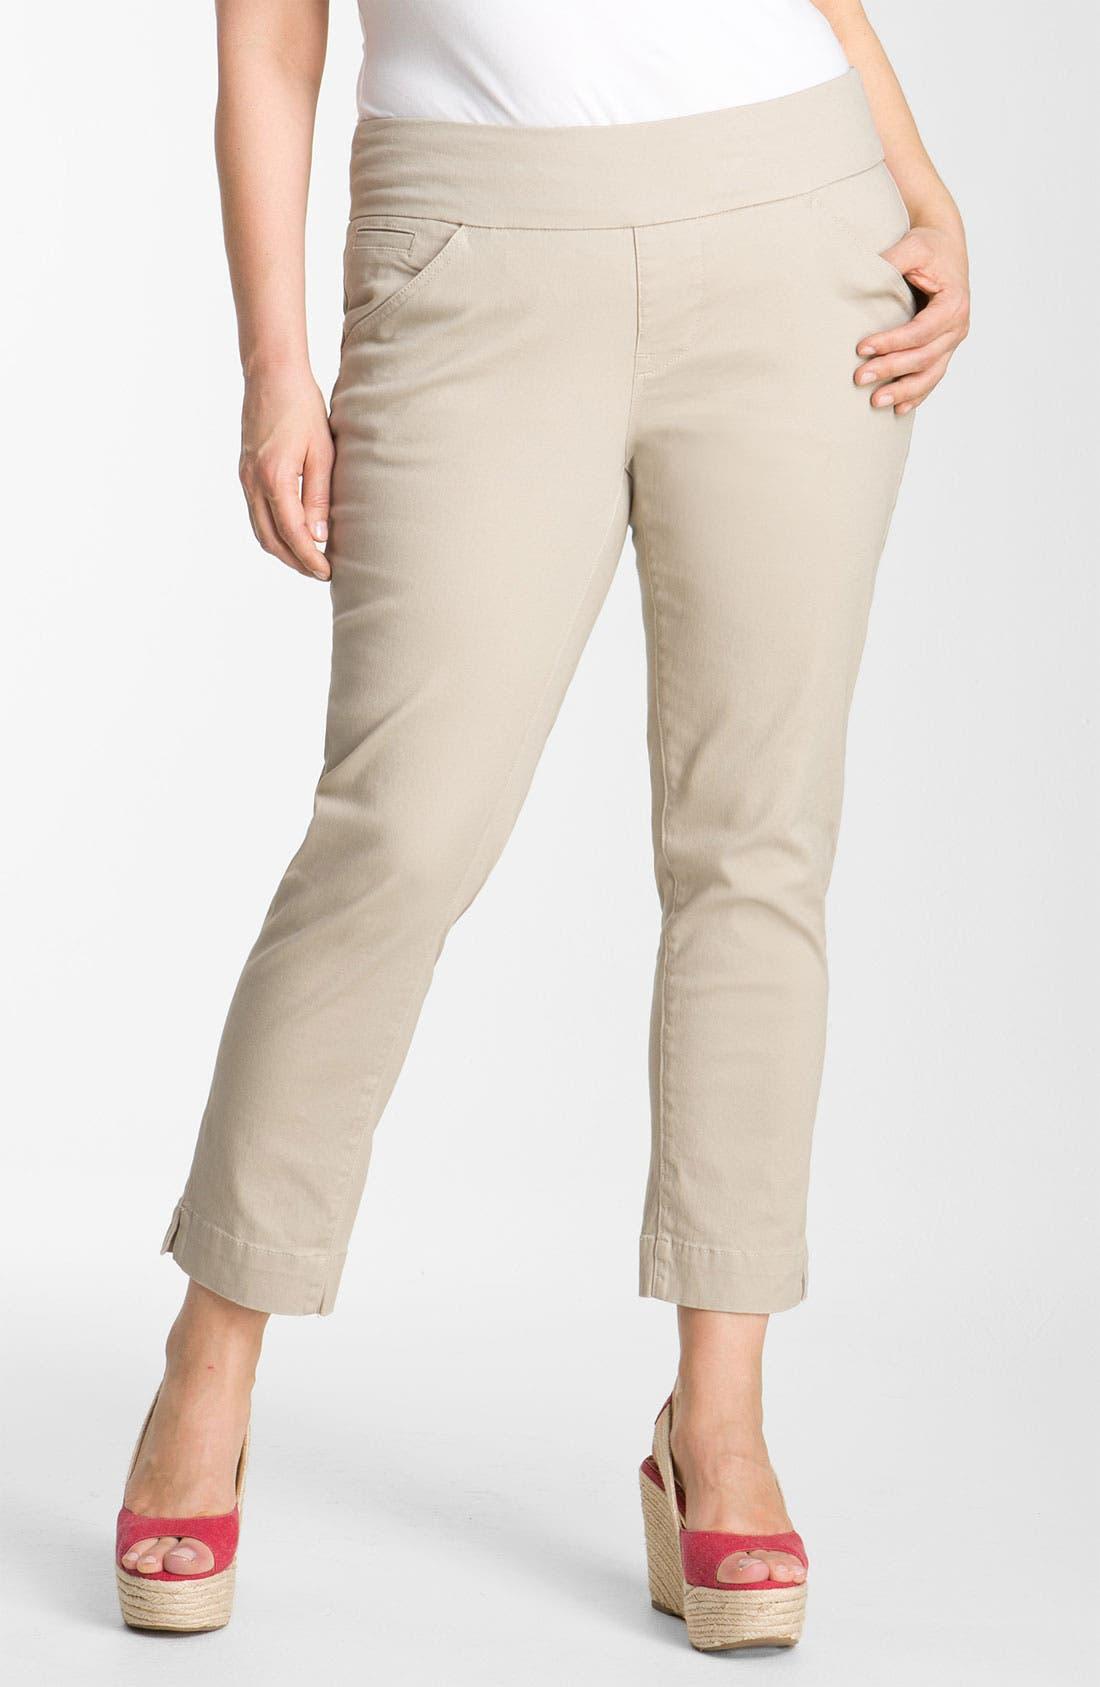 Alternate Image 1 Selected - Jag Jeans 'Attie' Slim Ankle Pants (Plus)